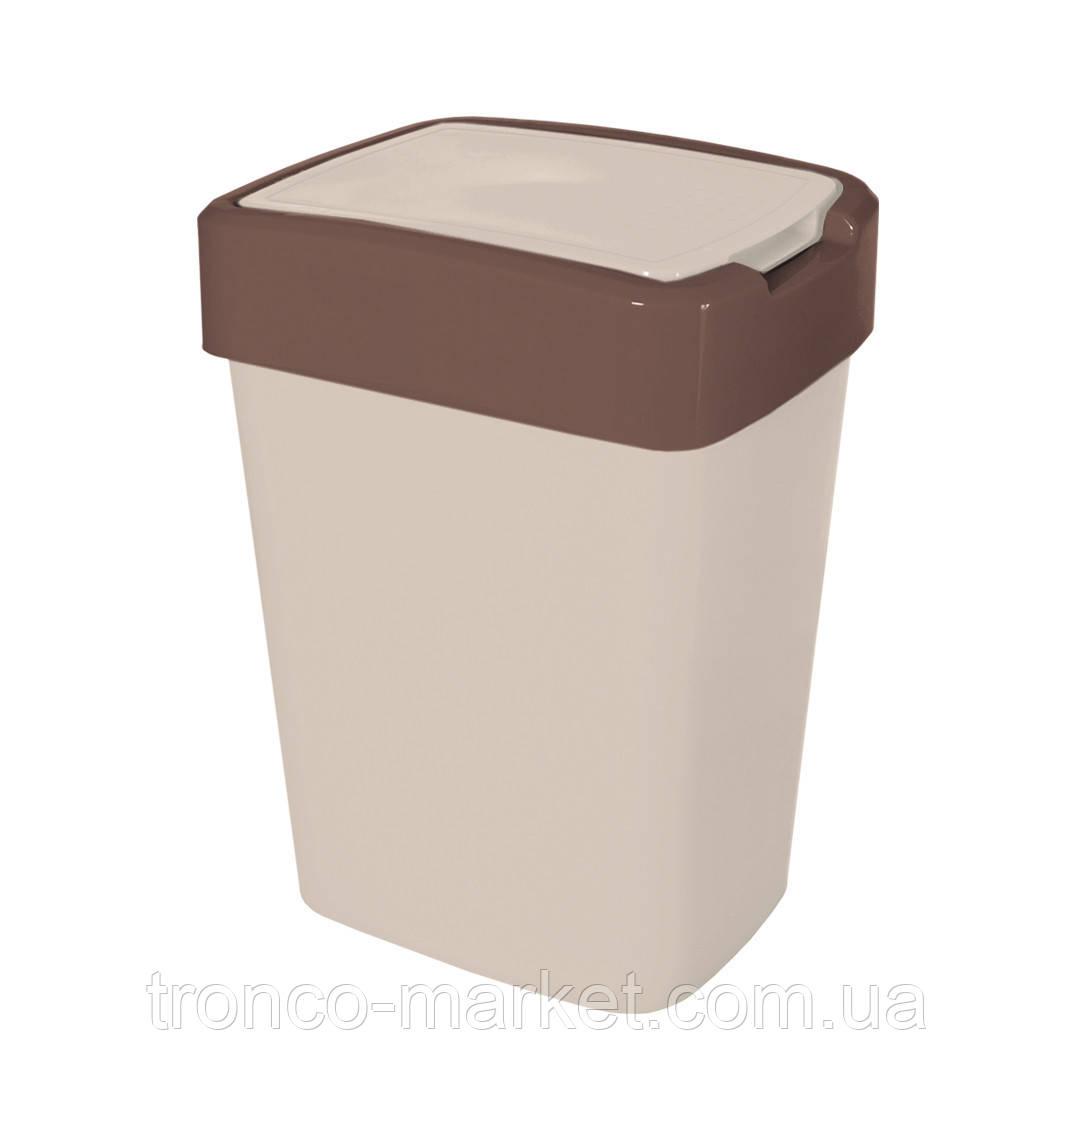 "Ведро для мусора ""Евро"" двухцветное-18л"